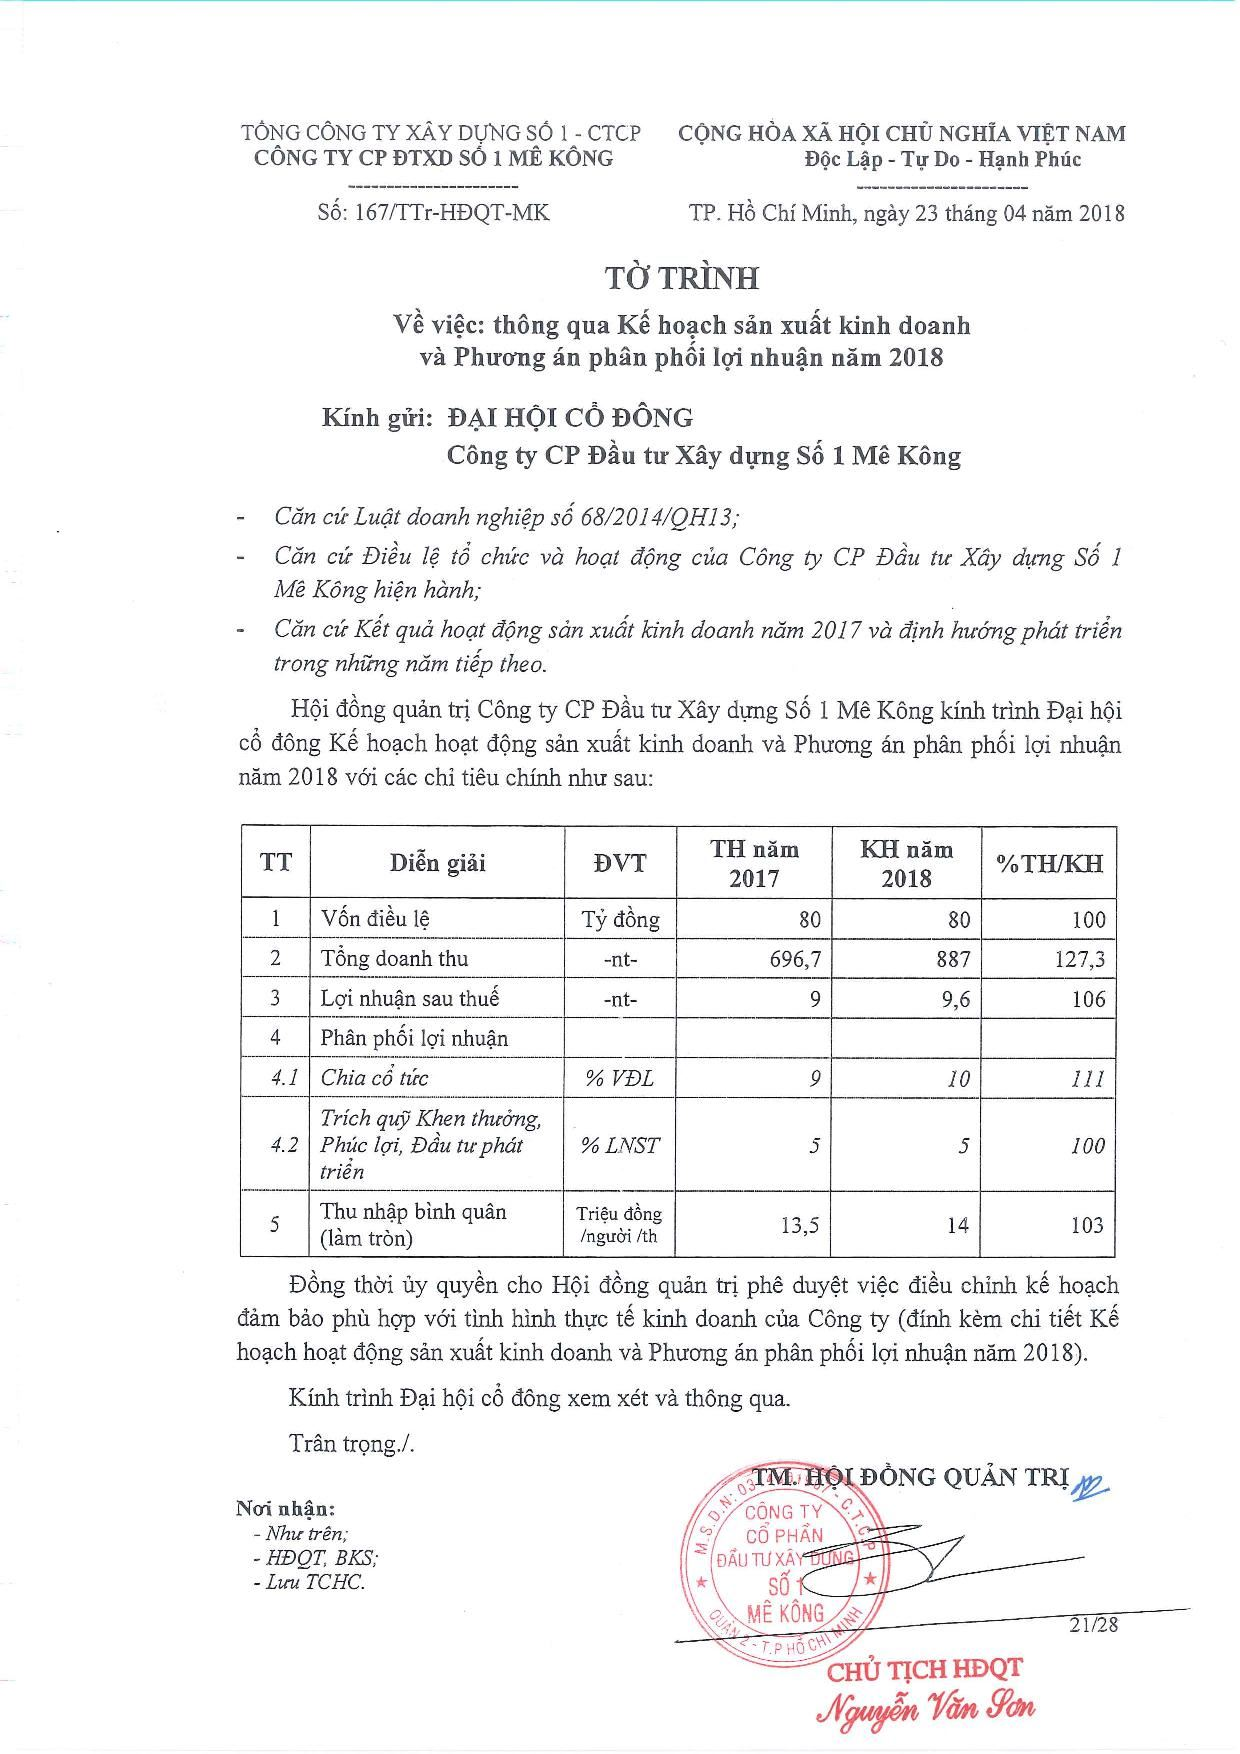 tai-lieu-dhcd-thuong-nien-2018-page (21)